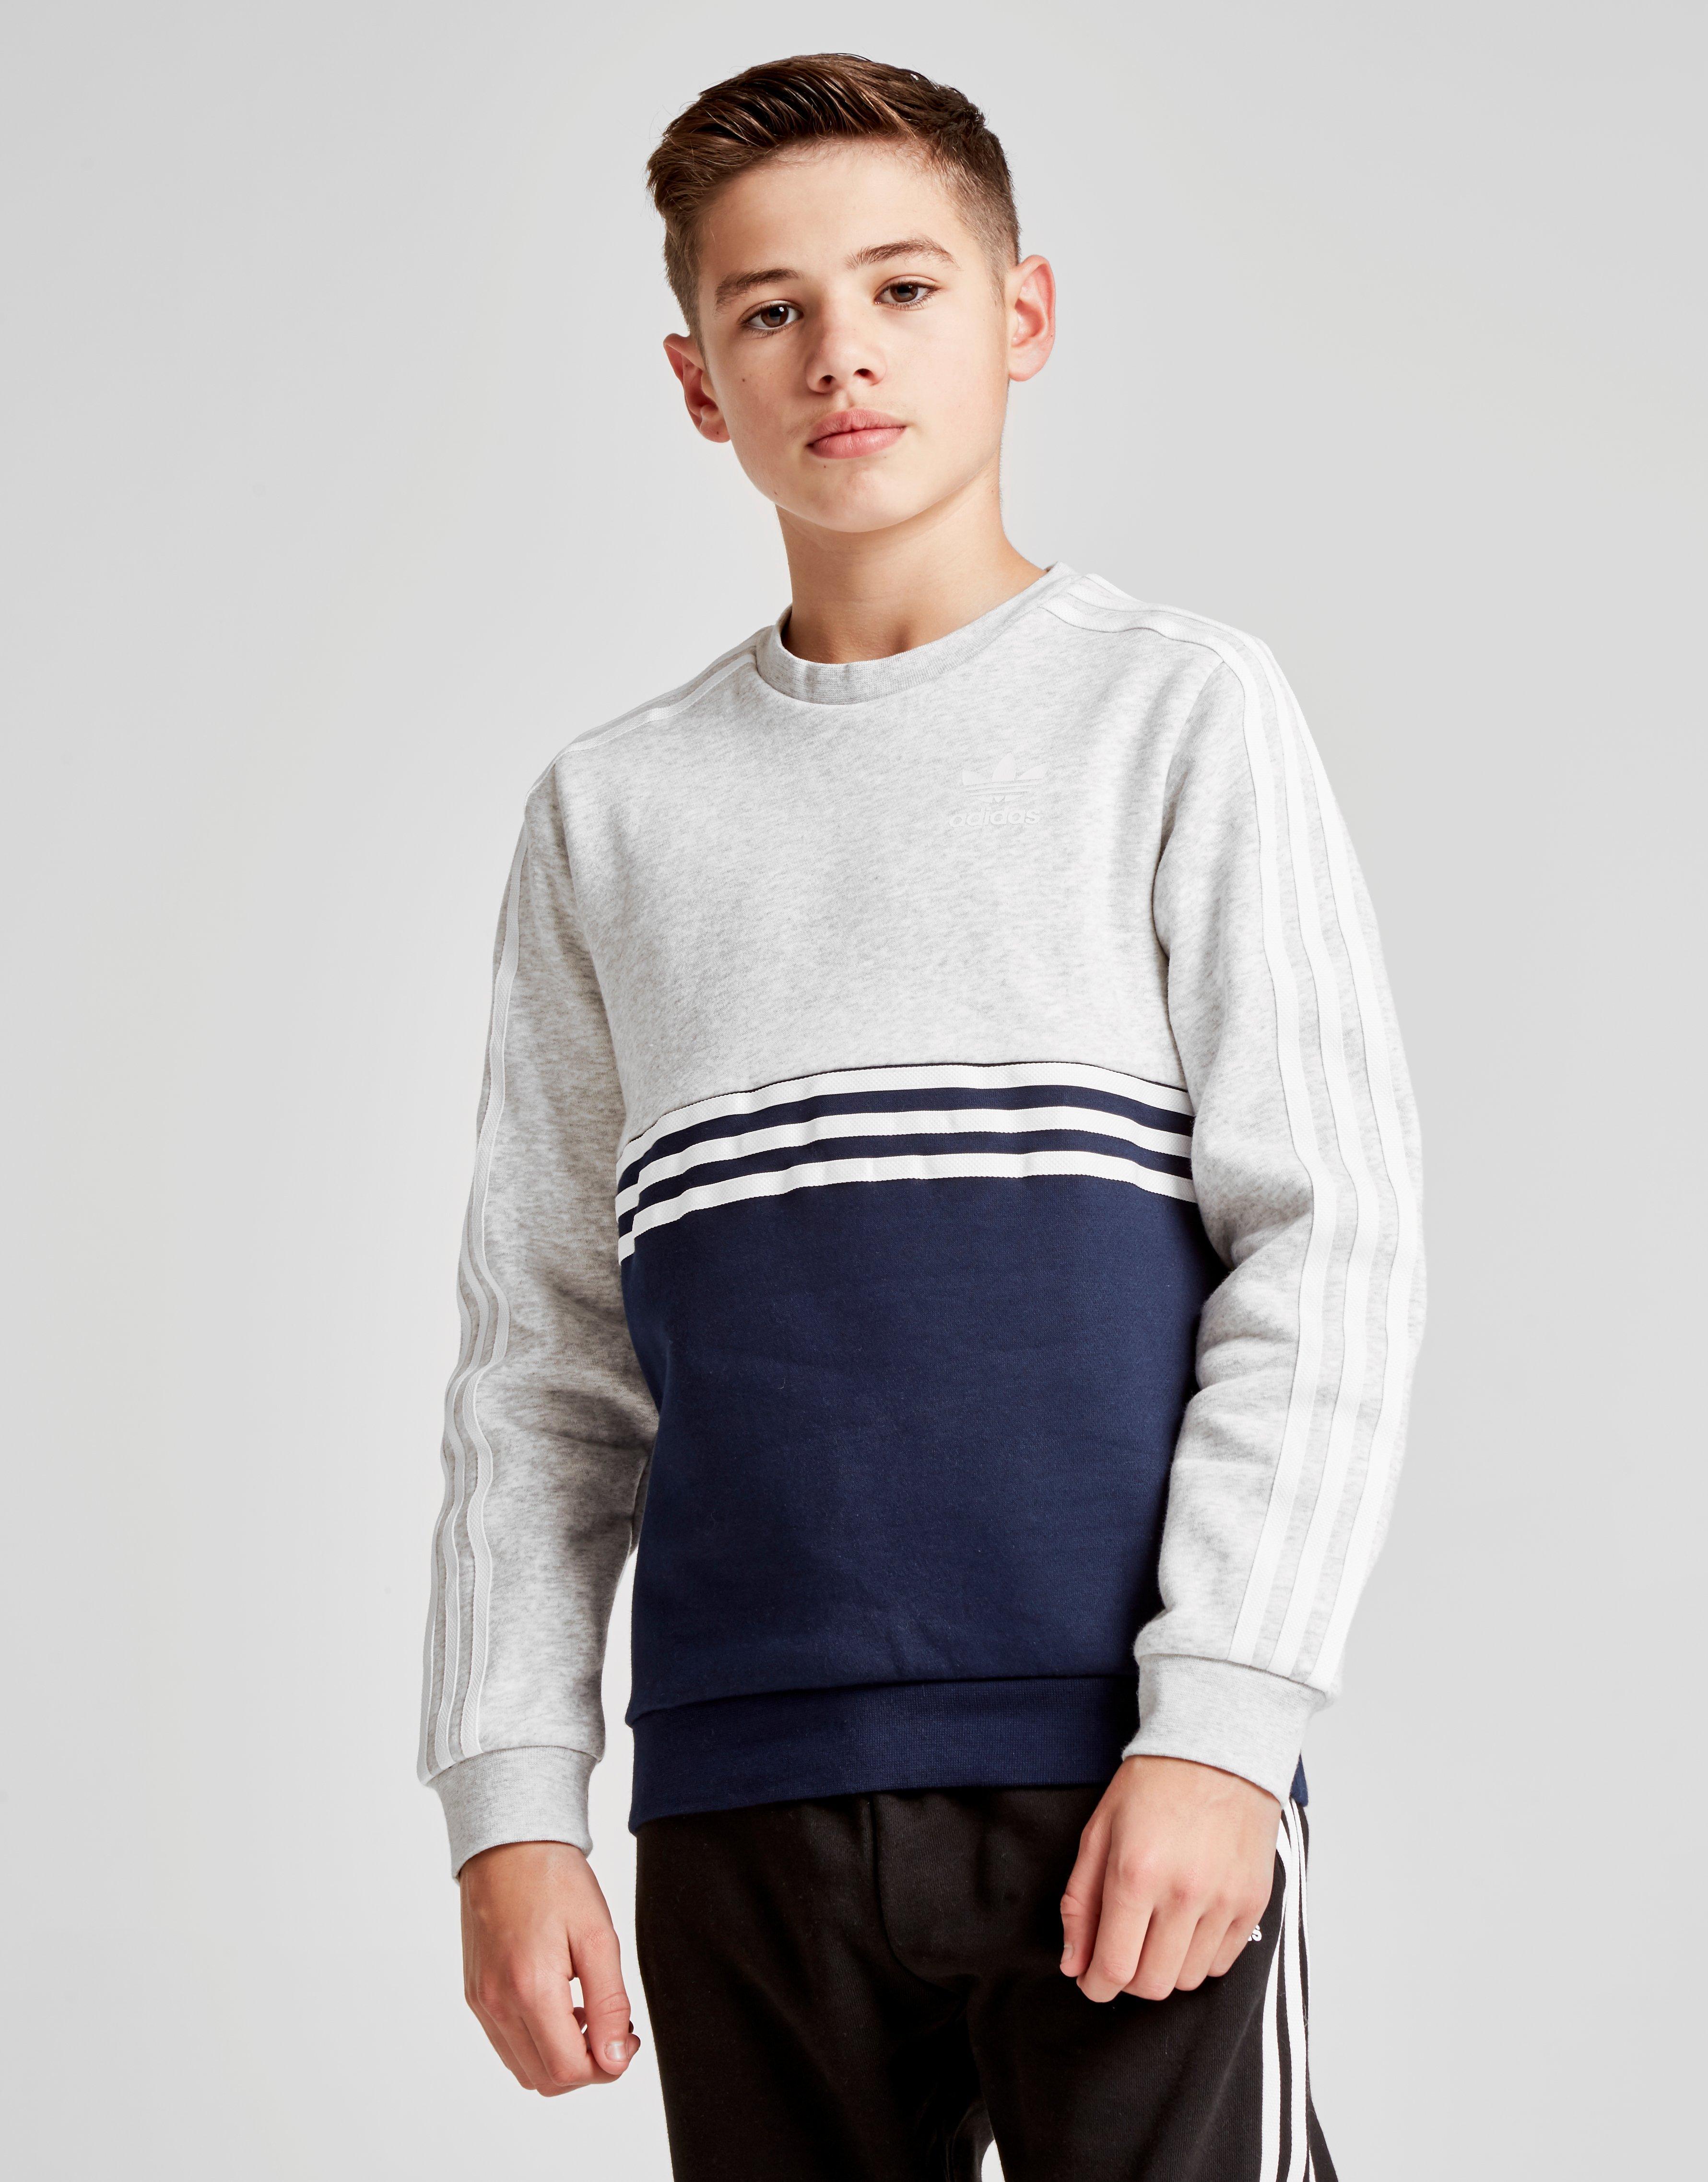 look good shoes sale new design buy good Details about New adidas Originals Boy's Authentic Colour Block Crew  Sweatshirt Grey